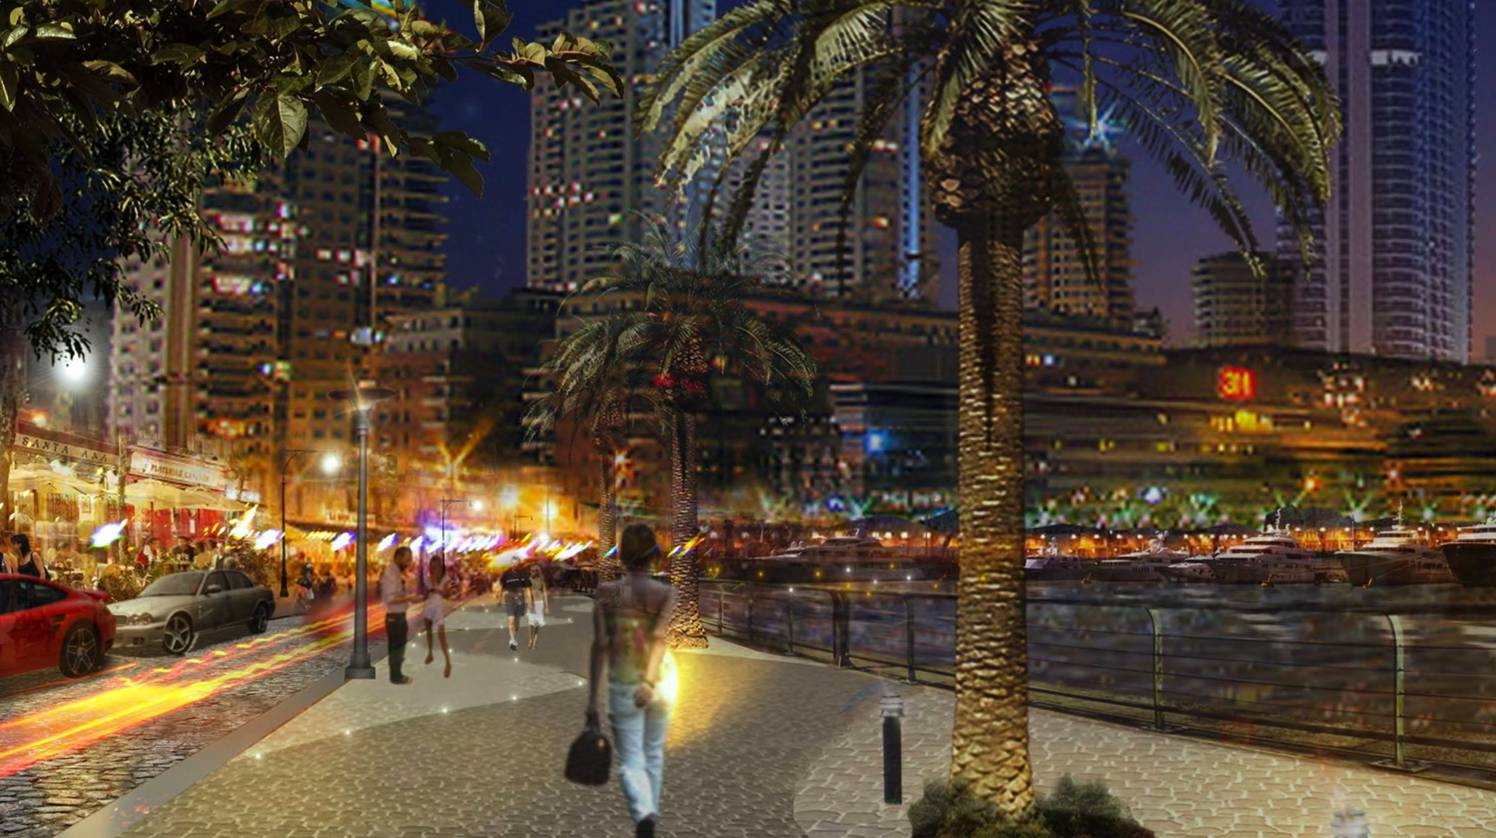 View of the esplanade in the Quay Neighborhood